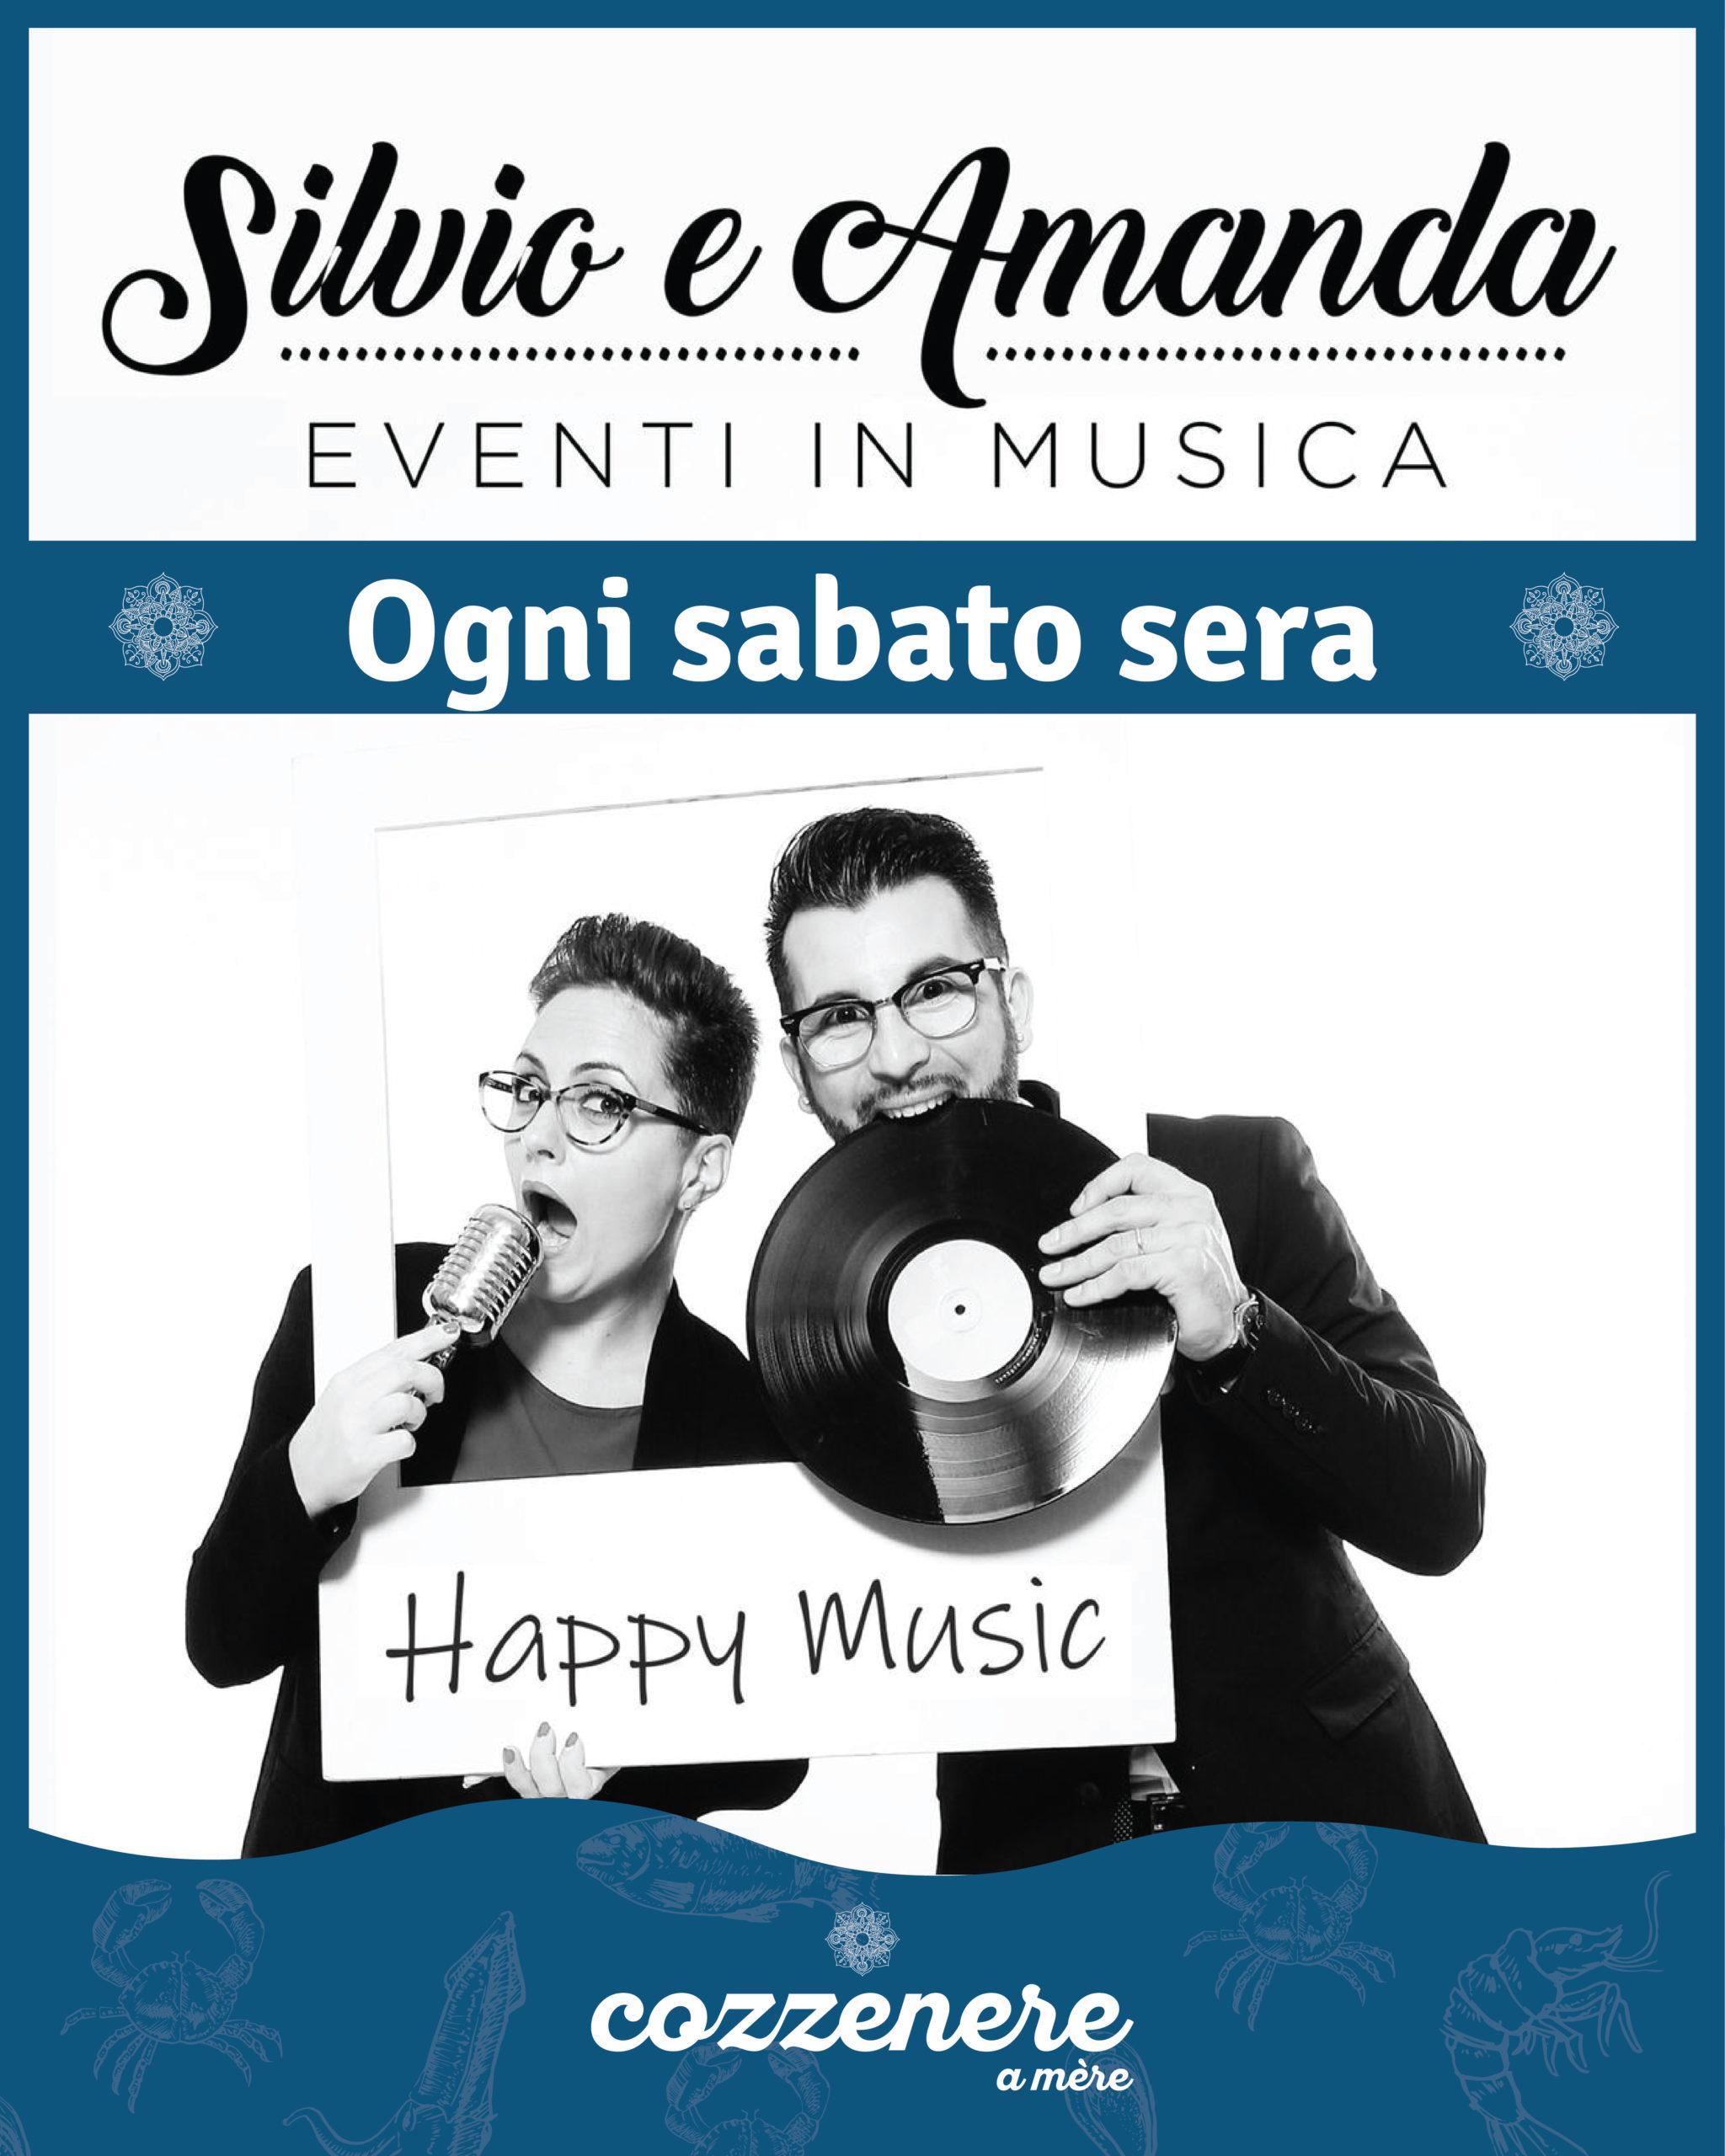 Silvio & Amanda